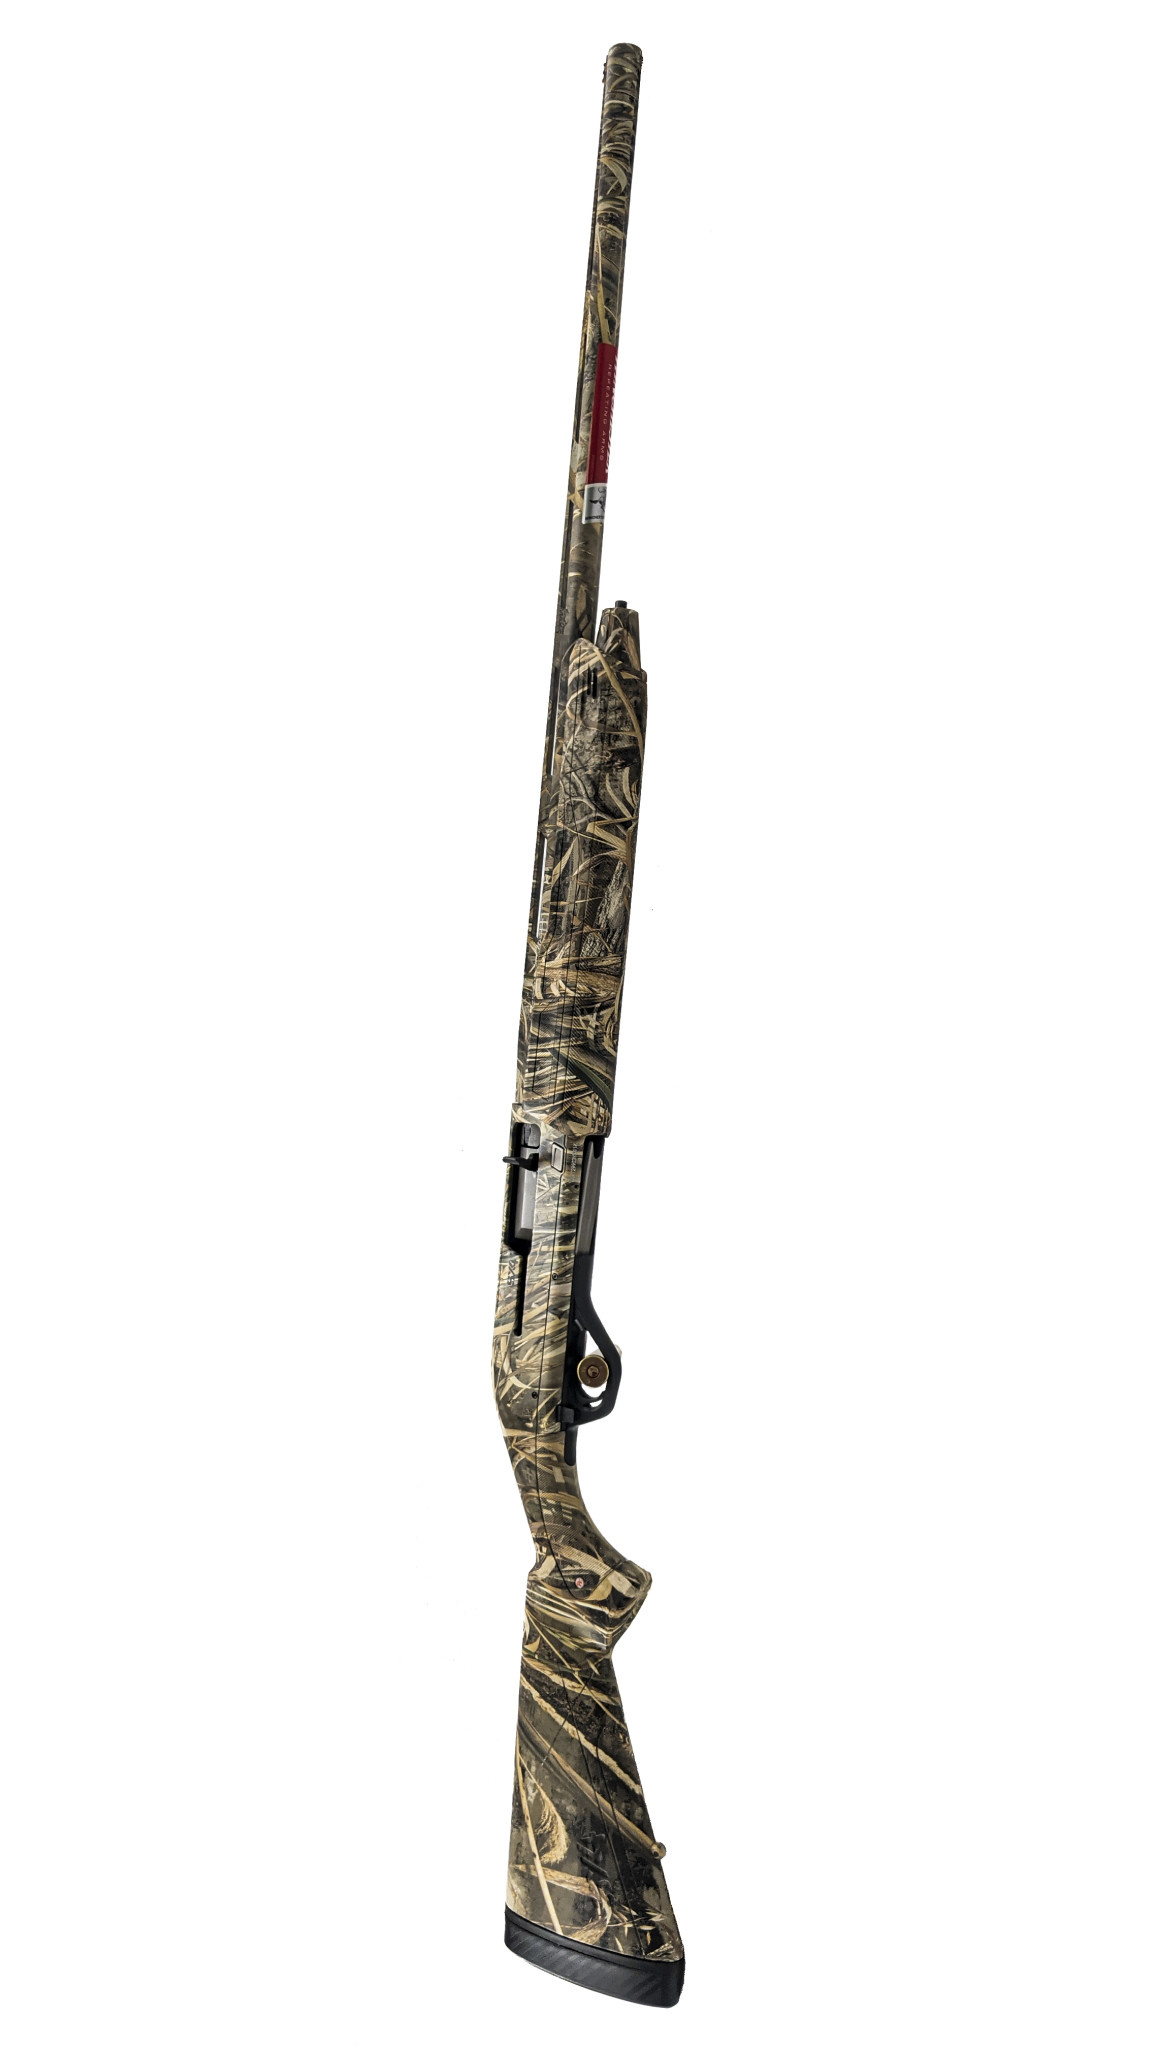 "Winchester SX4 Waterfowl Max5 3.5"" 12ga"